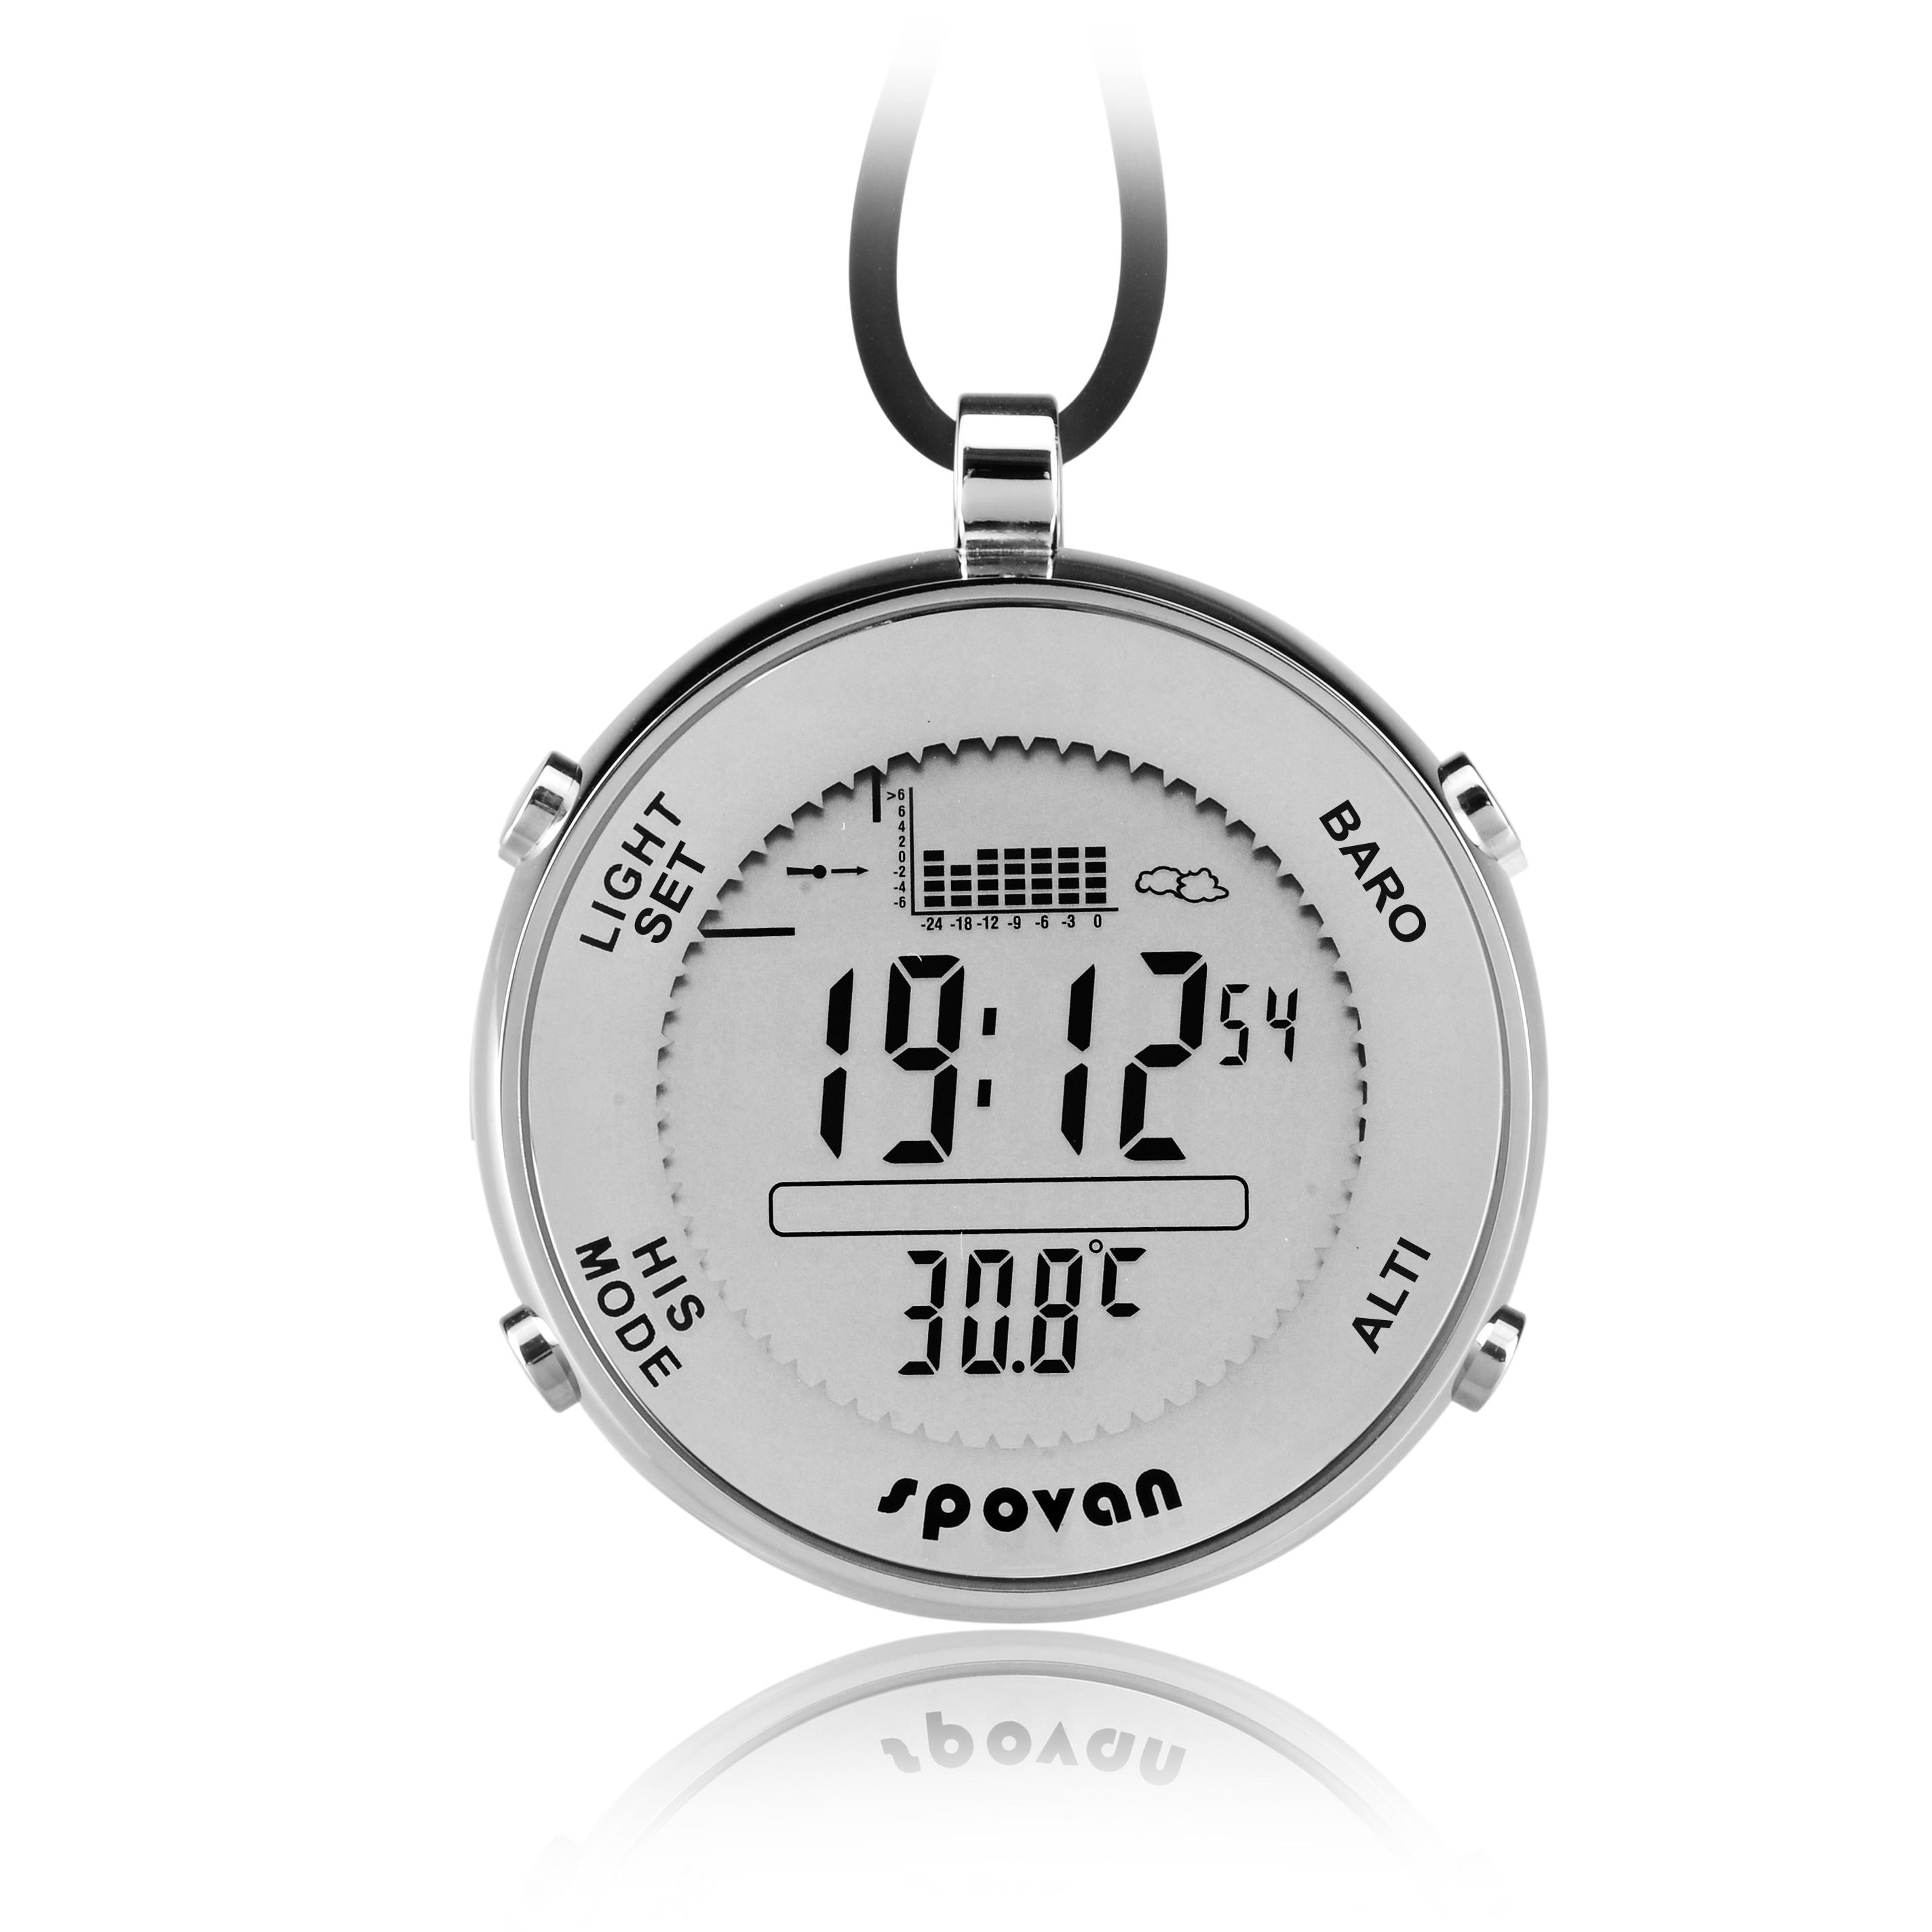 Multifunction Waterproof Spovan Watch Altimeter Compass Stopwatch Fishing Barometer Outdoor Sports Watch Men's Watches dl-o03 Watches